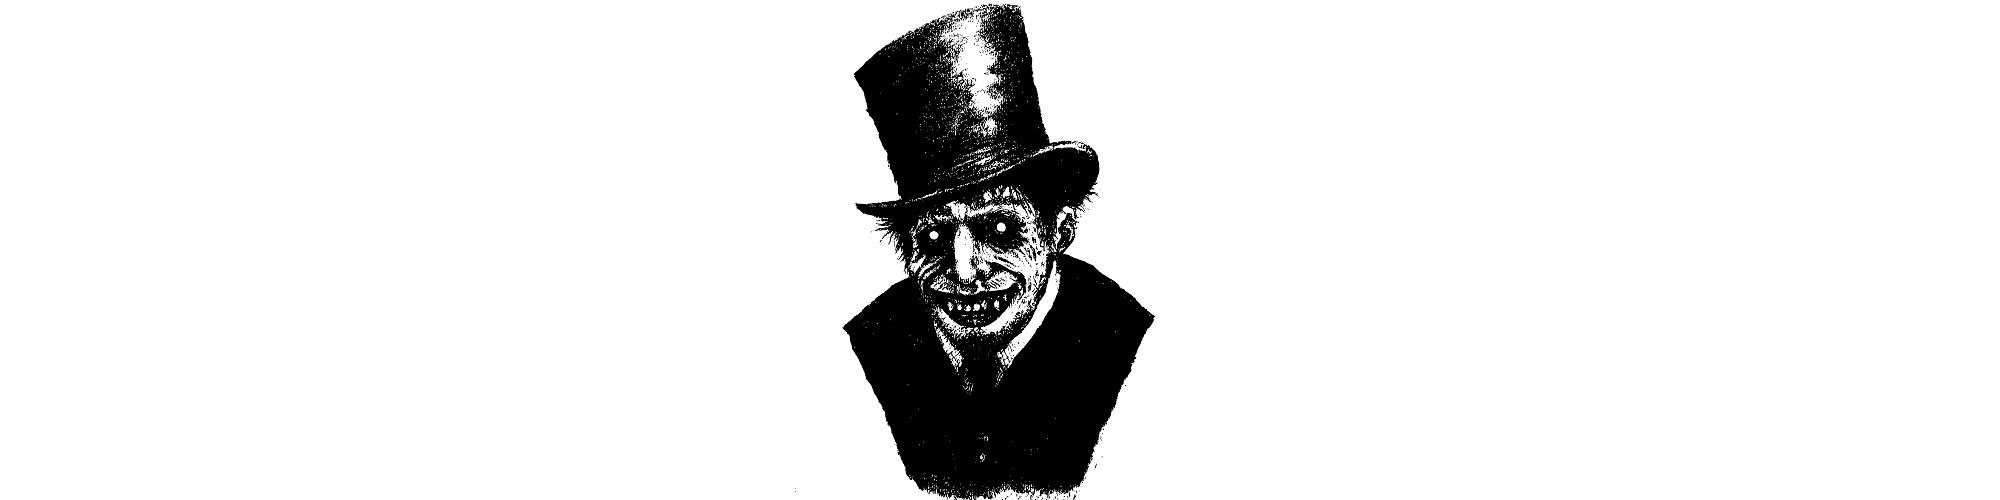 "Spooky man illustration - ""Prepare for Spooks"" microfiction"